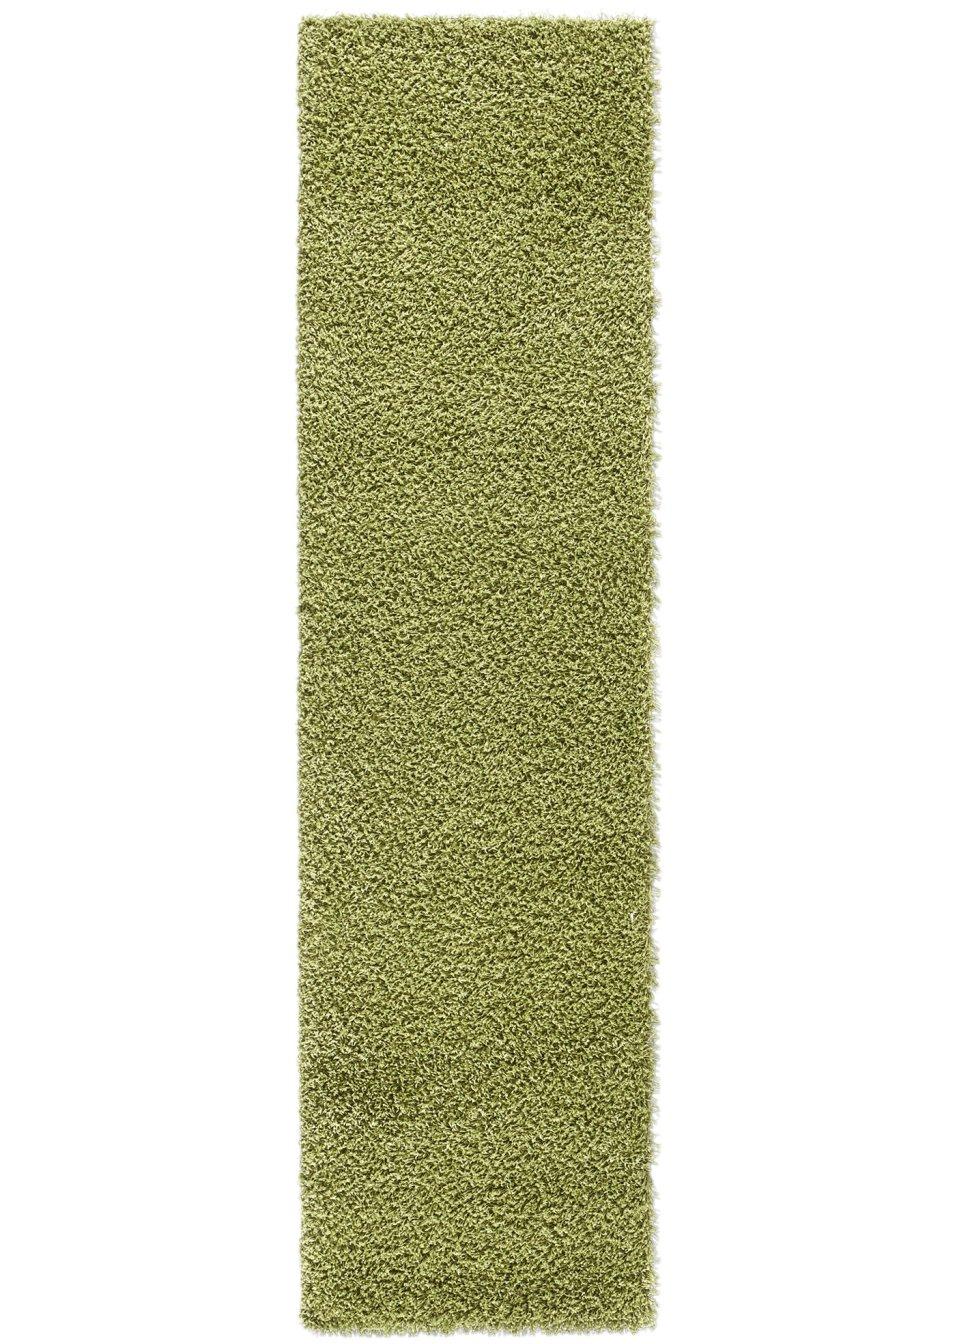 tapis de passage toronto vert bpc living acheter online. Black Bedroom Furniture Sets. Home Design Ideas